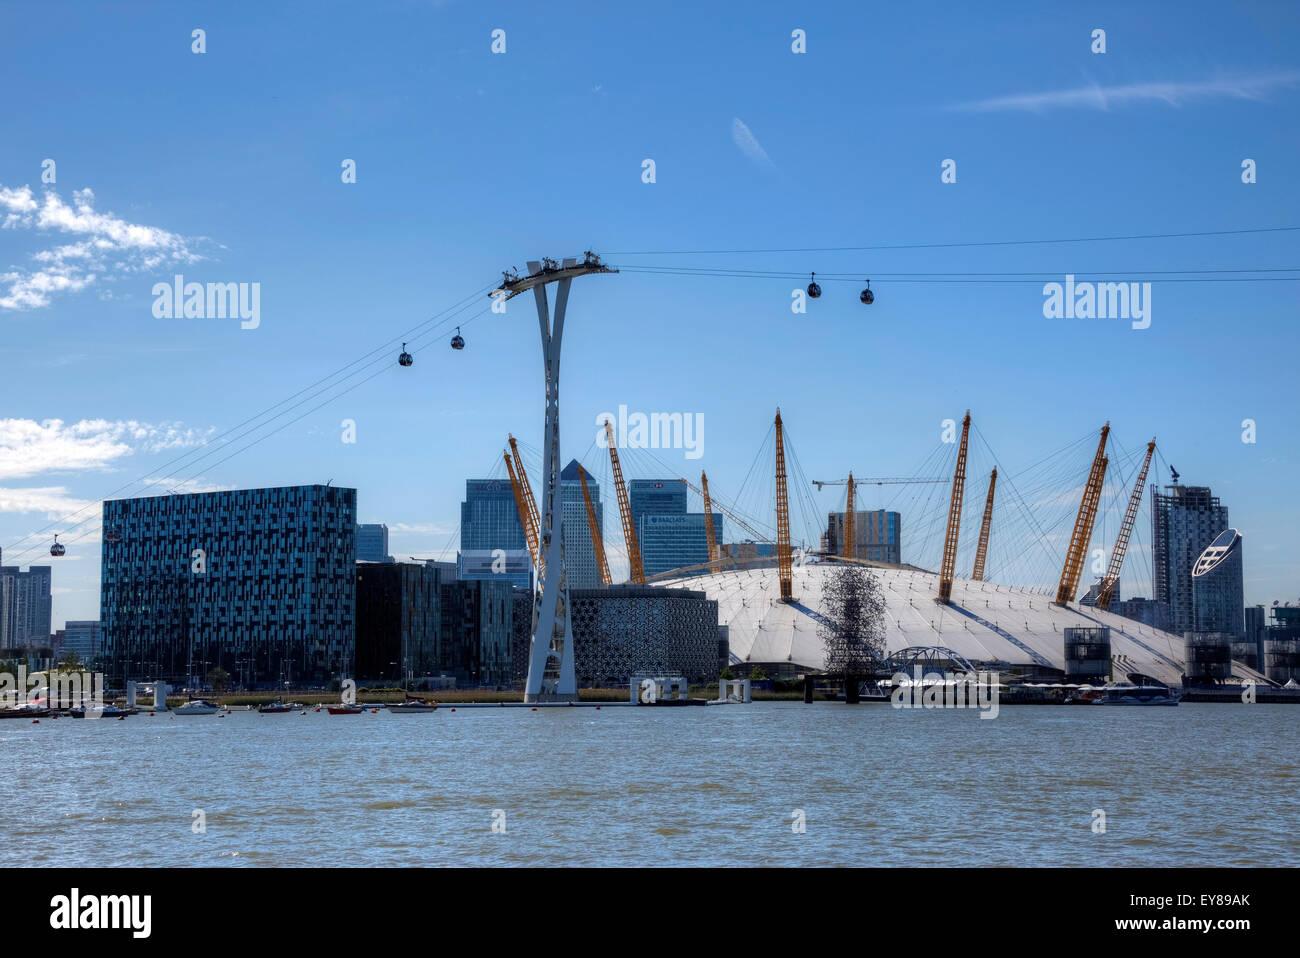 The O2 Arena, Greenwich, London, England, United Kingdom - Stock Image